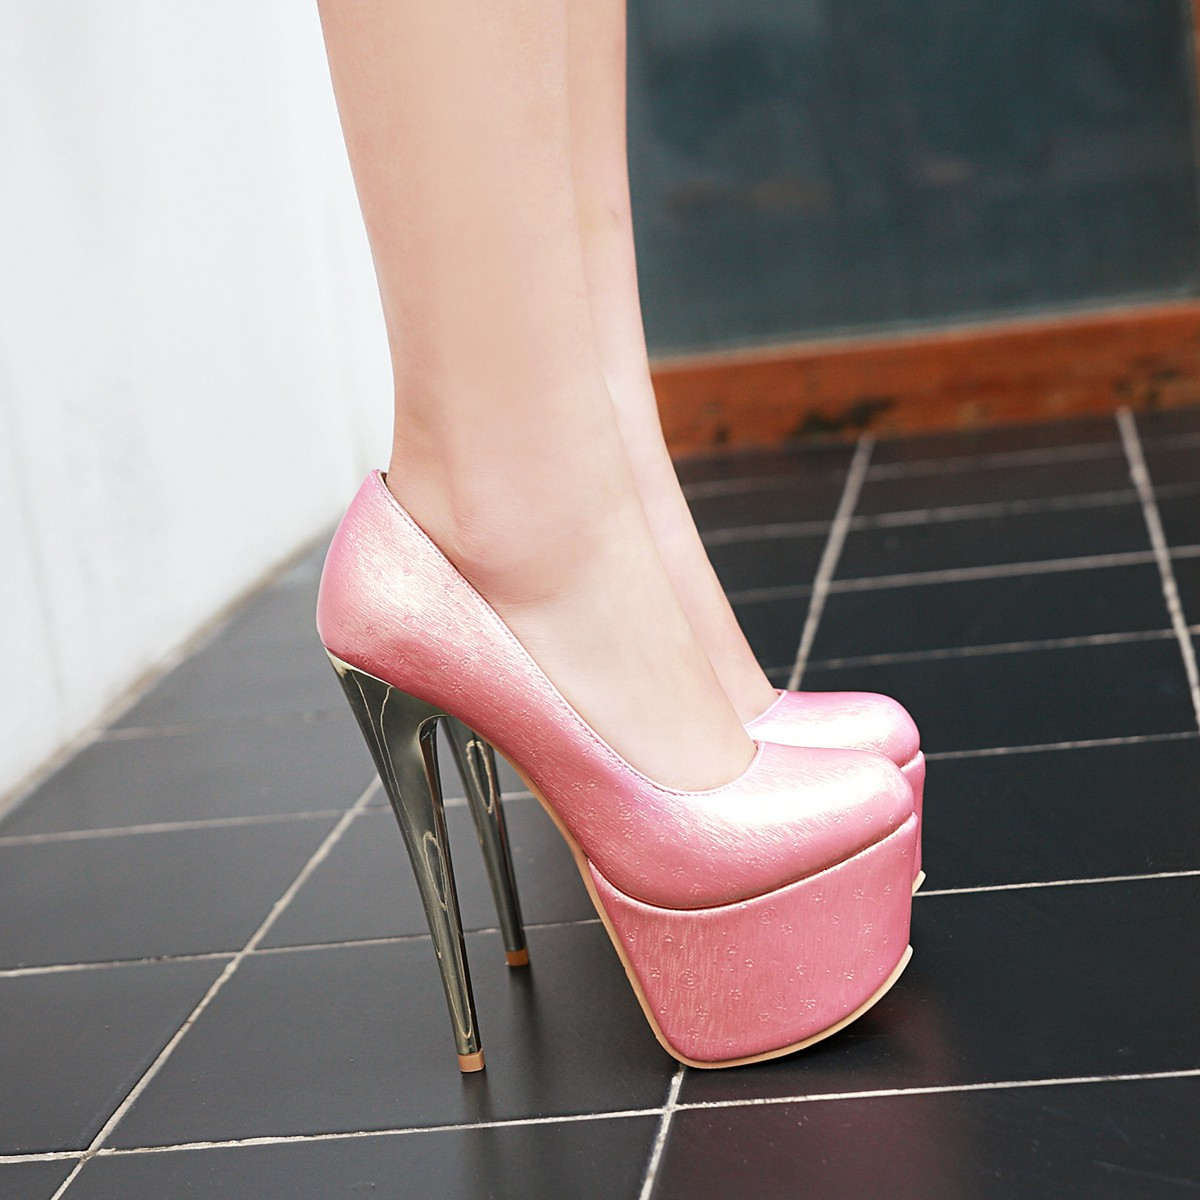 d34e8711667a US  41 - 2018 autumn platform extreme high heels 16cm stilettos round toe  pink nude black wedding shoes small size 32 31 - www.ardenfurtado.com